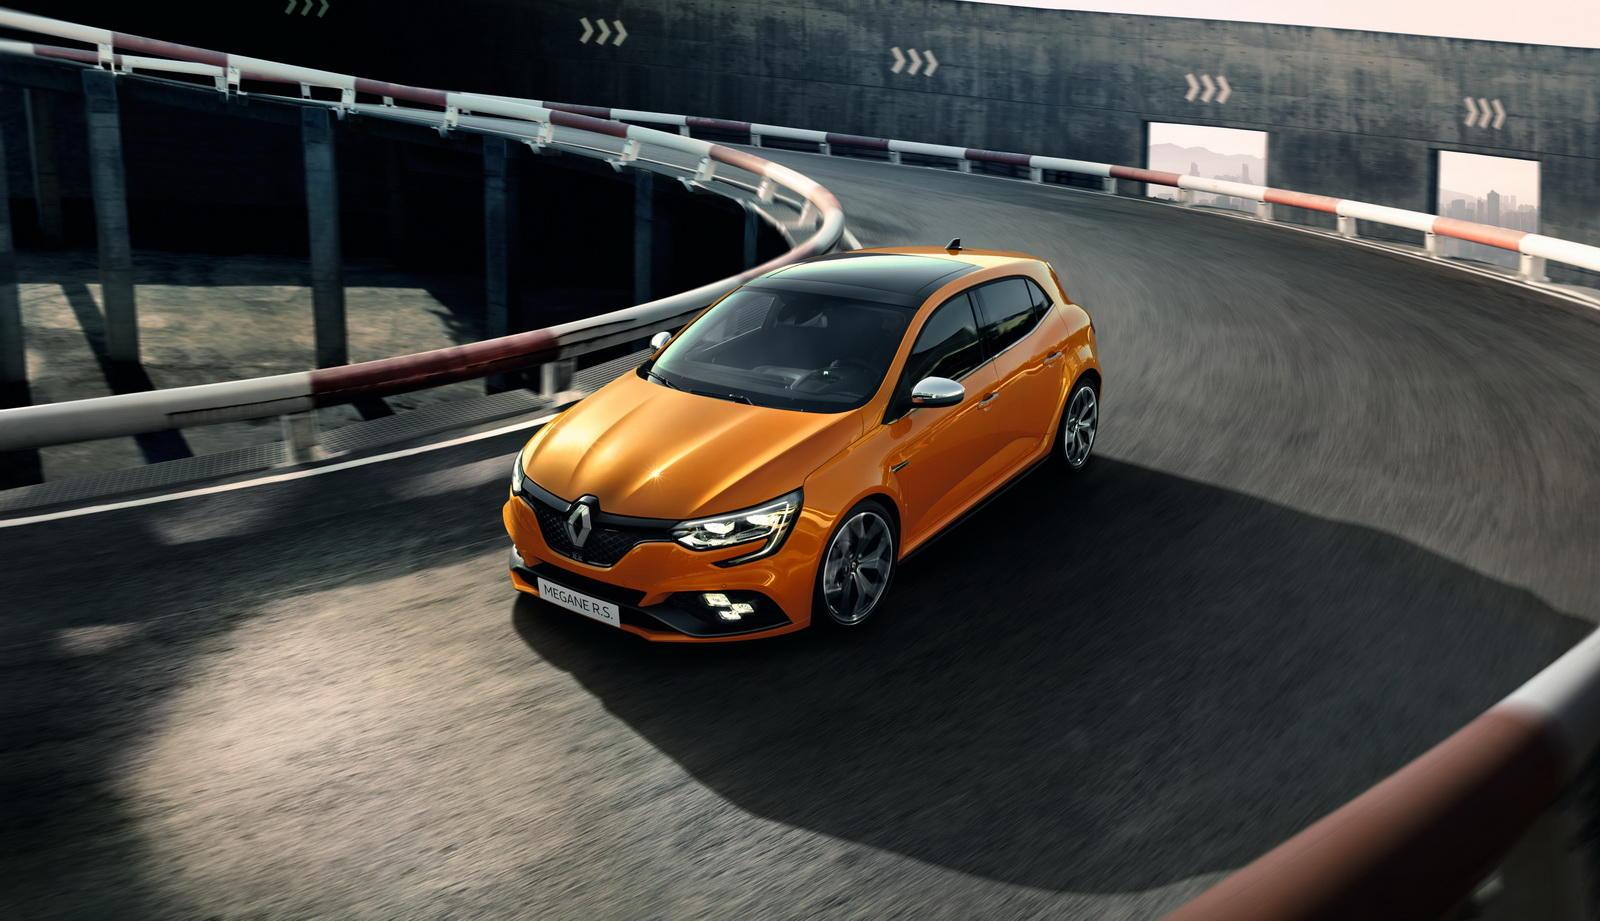 Renault Megane RS - Renault Megane RS